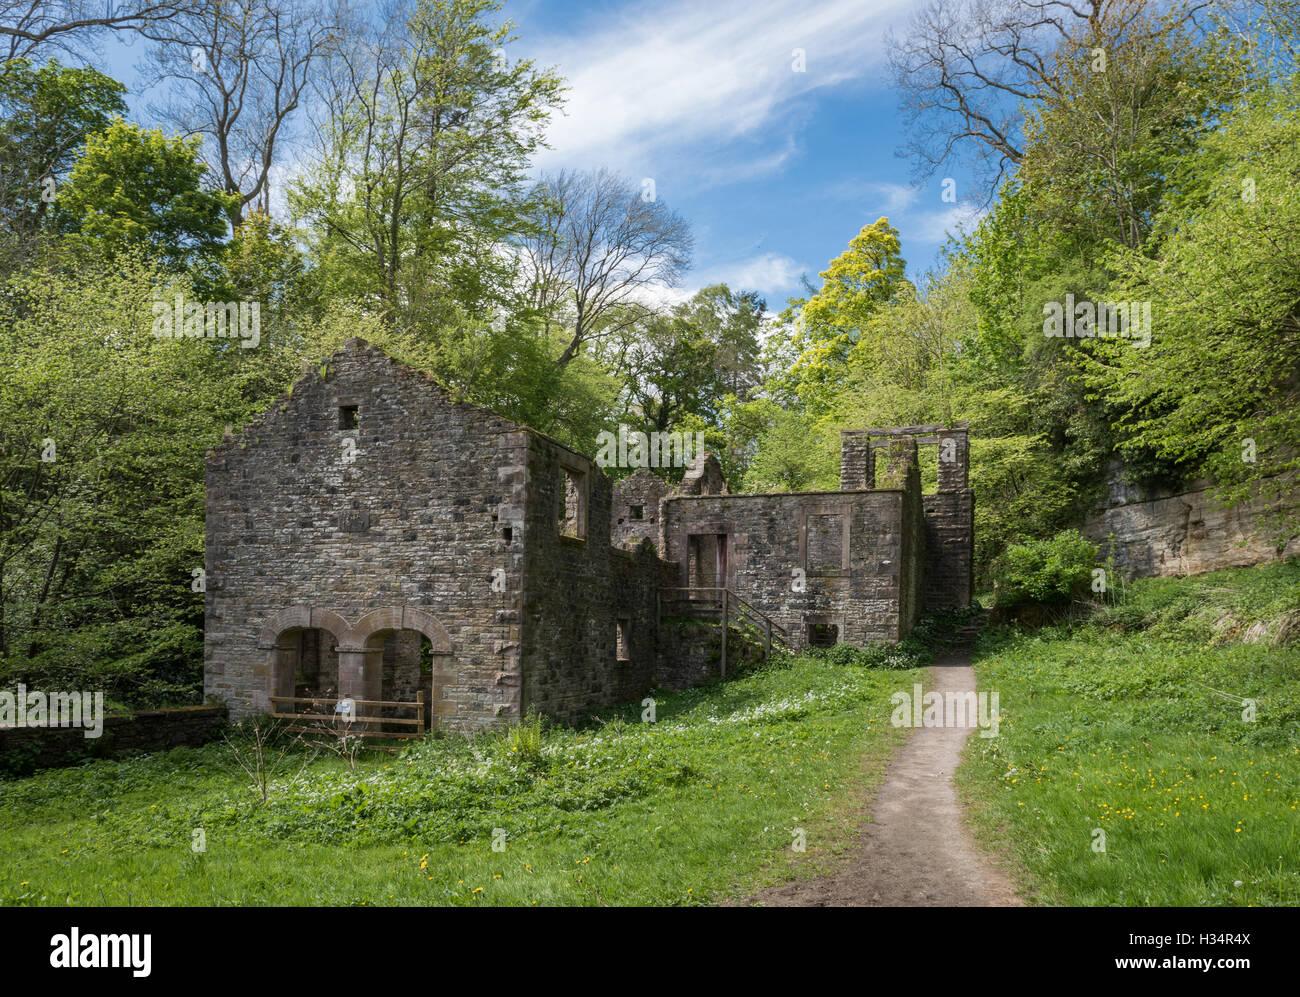 Old bobbin mill near the Howk, Caldbeck, Cumbria - Stock Image